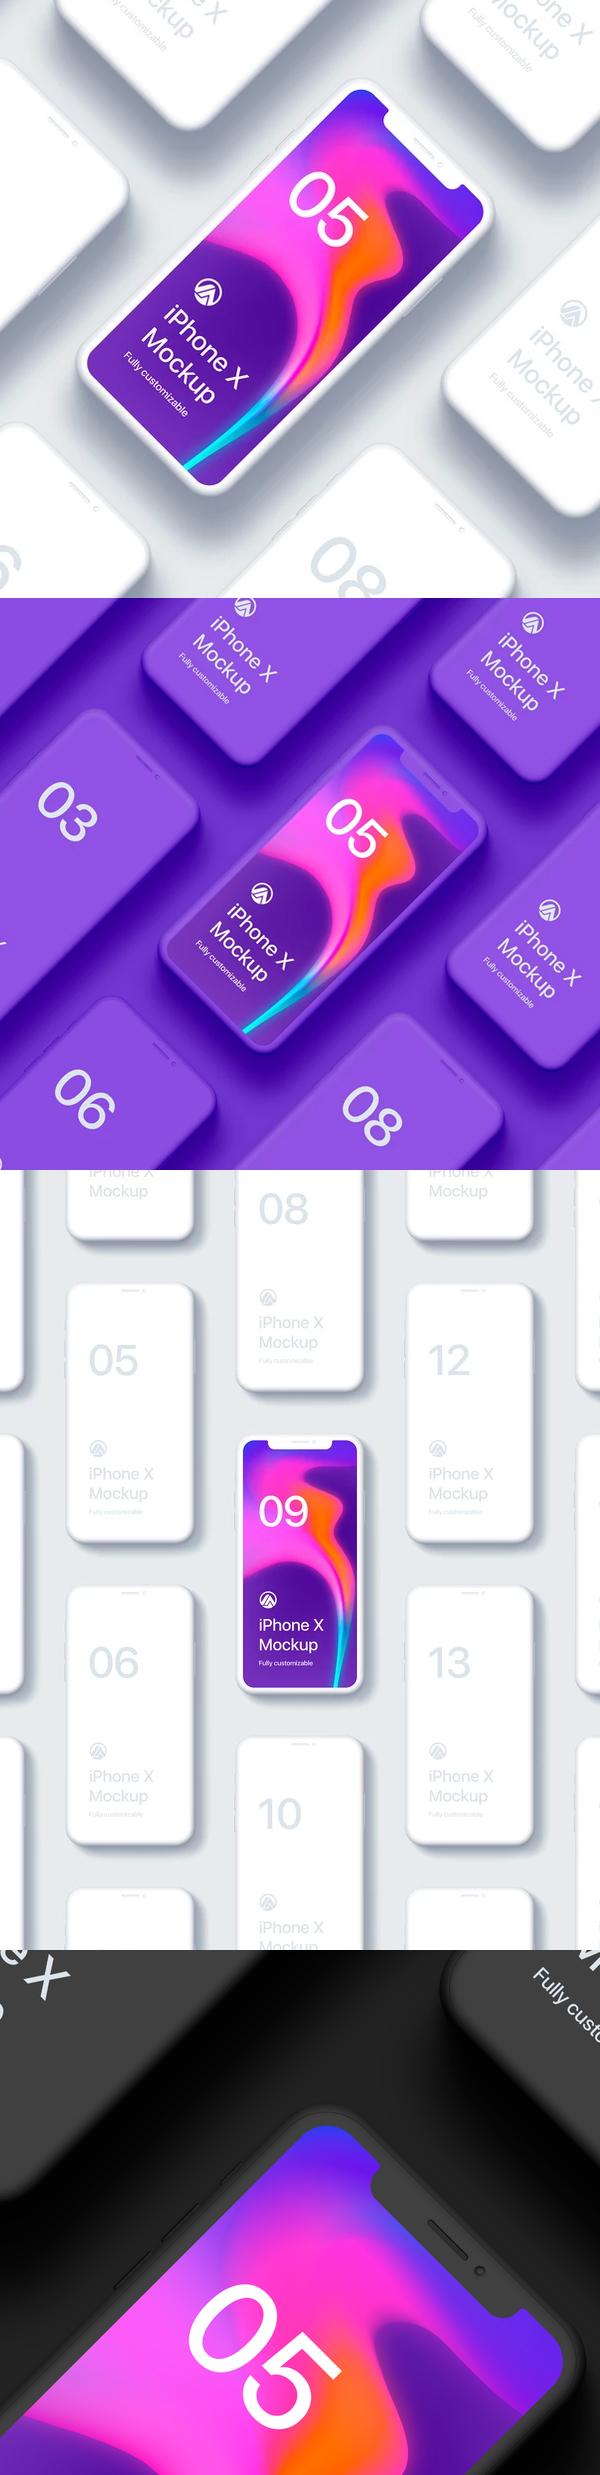 Free PSD iPhone X Clay Isometric Mockup